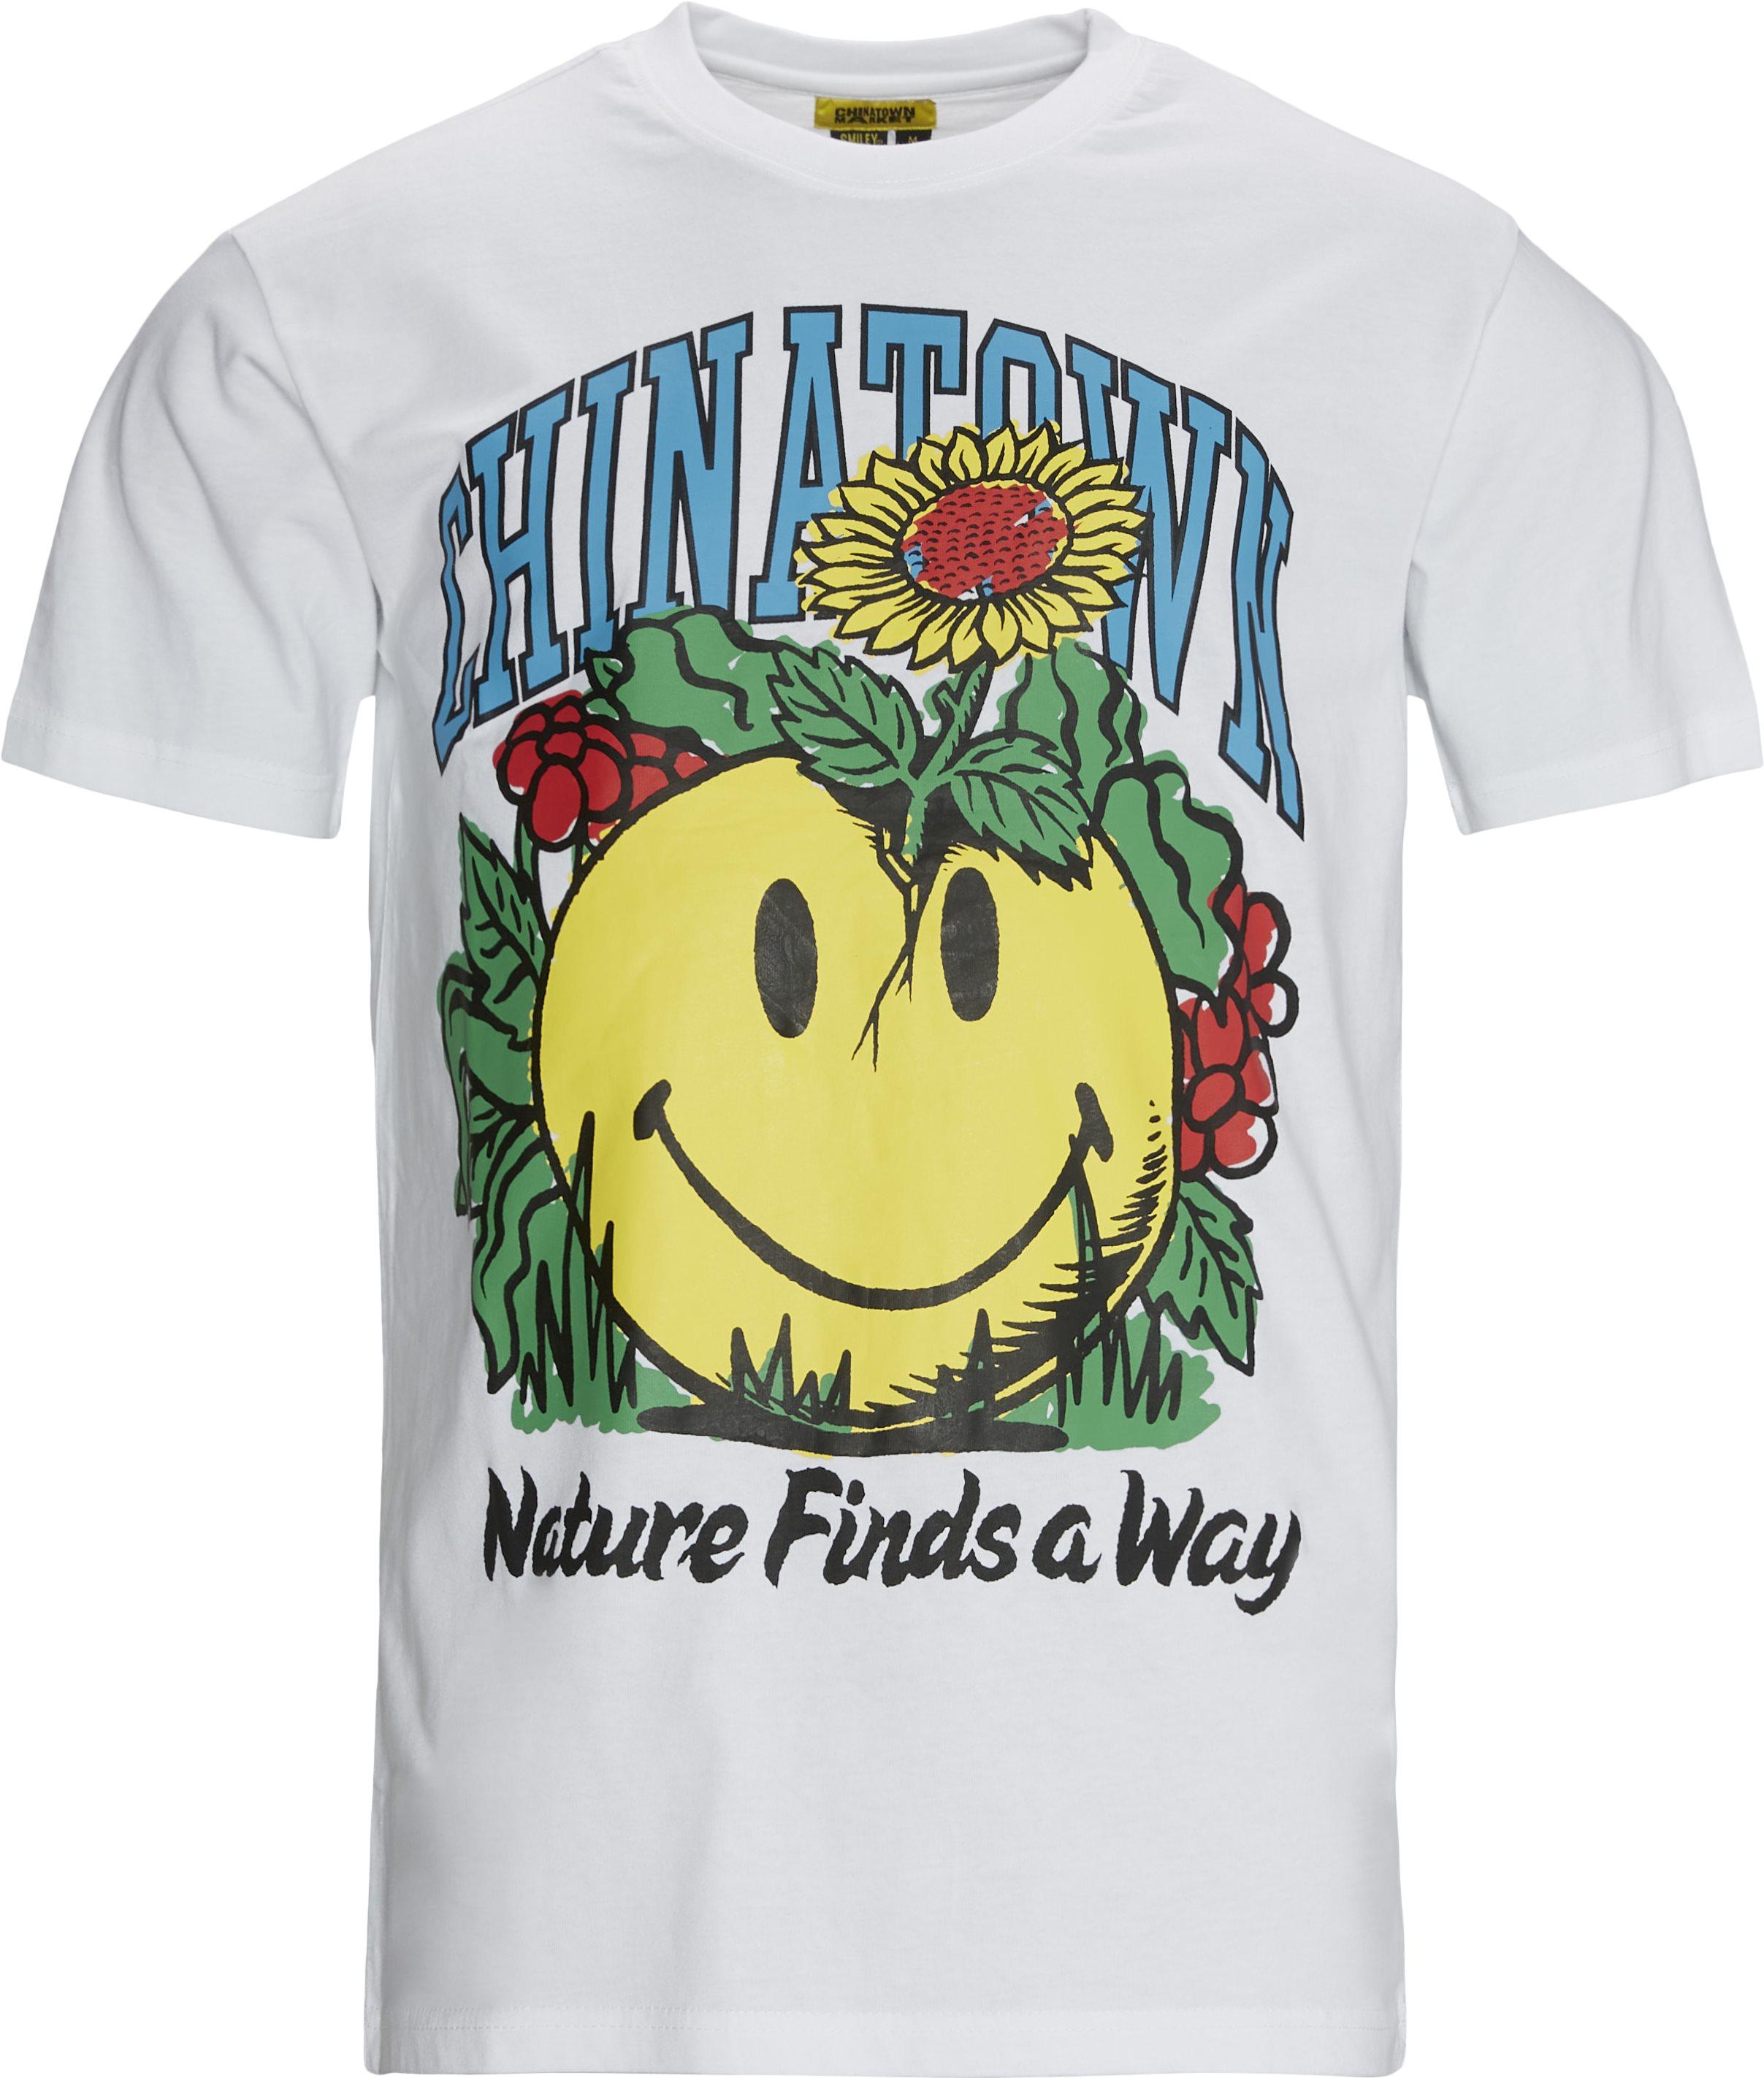 SMILEY PLANTER t-shirt - T-shirts - Regular fit - Hvid